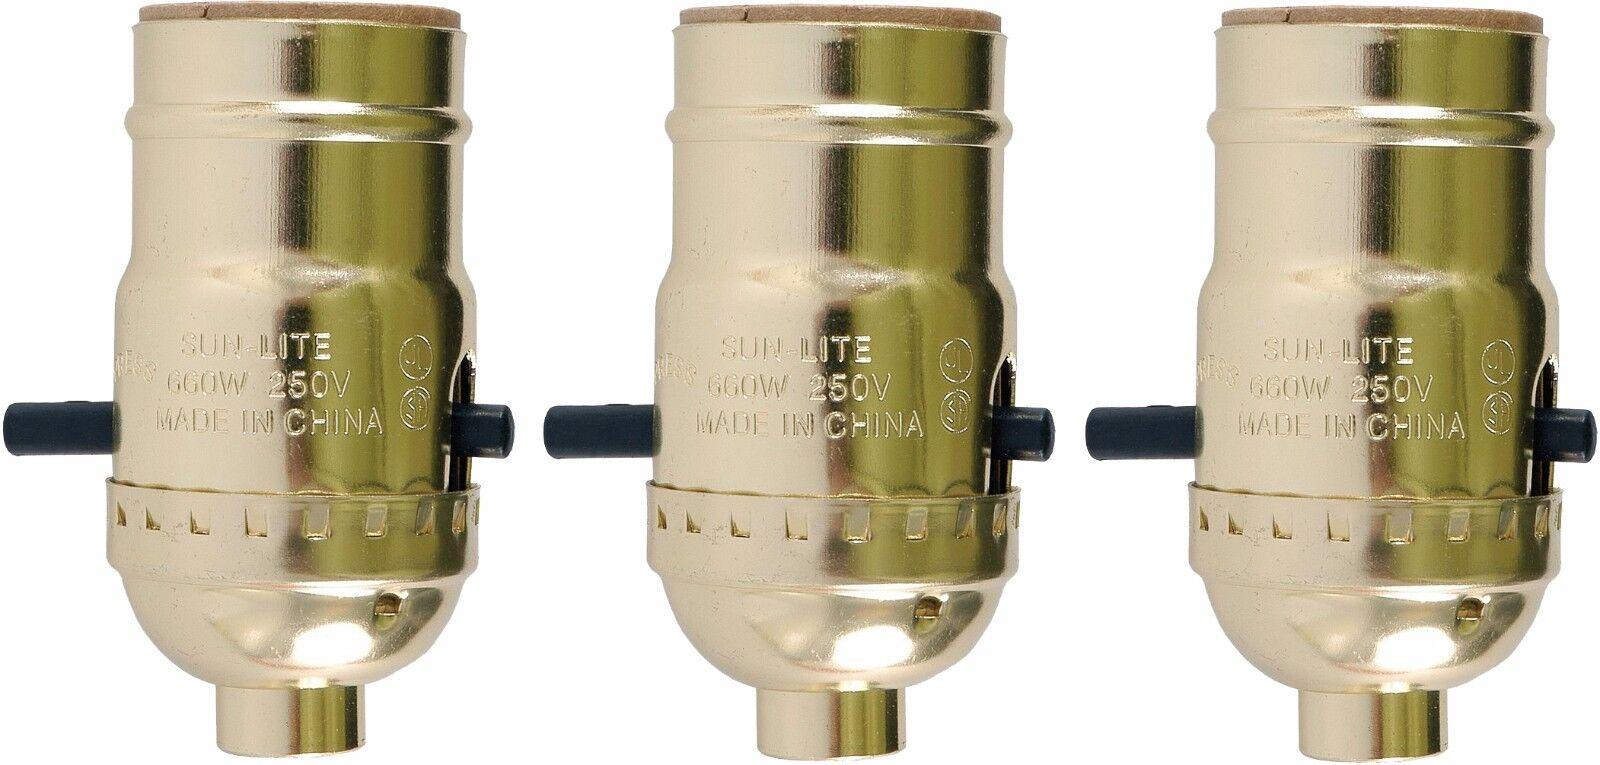 3 Pack of Push Thru On/Off Lamp Sockets Medium Base,Gold Shell, Lamp Repair Part Collectibles